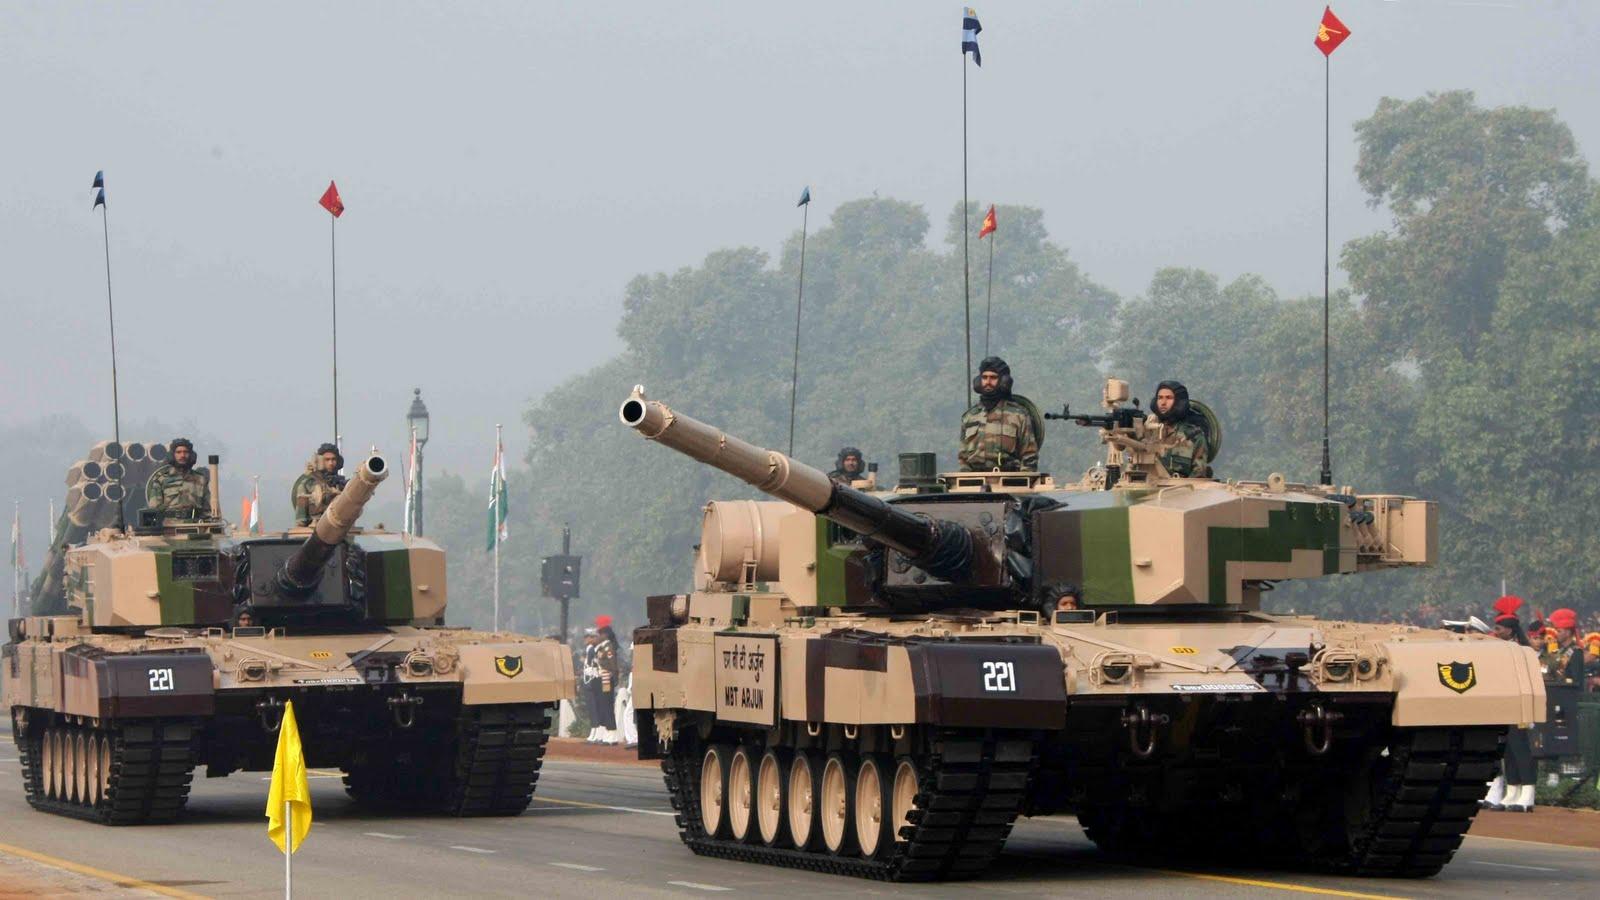 Arjun Series : The Making of Arjun Mk-II – A Potent Slayer of the Enemies